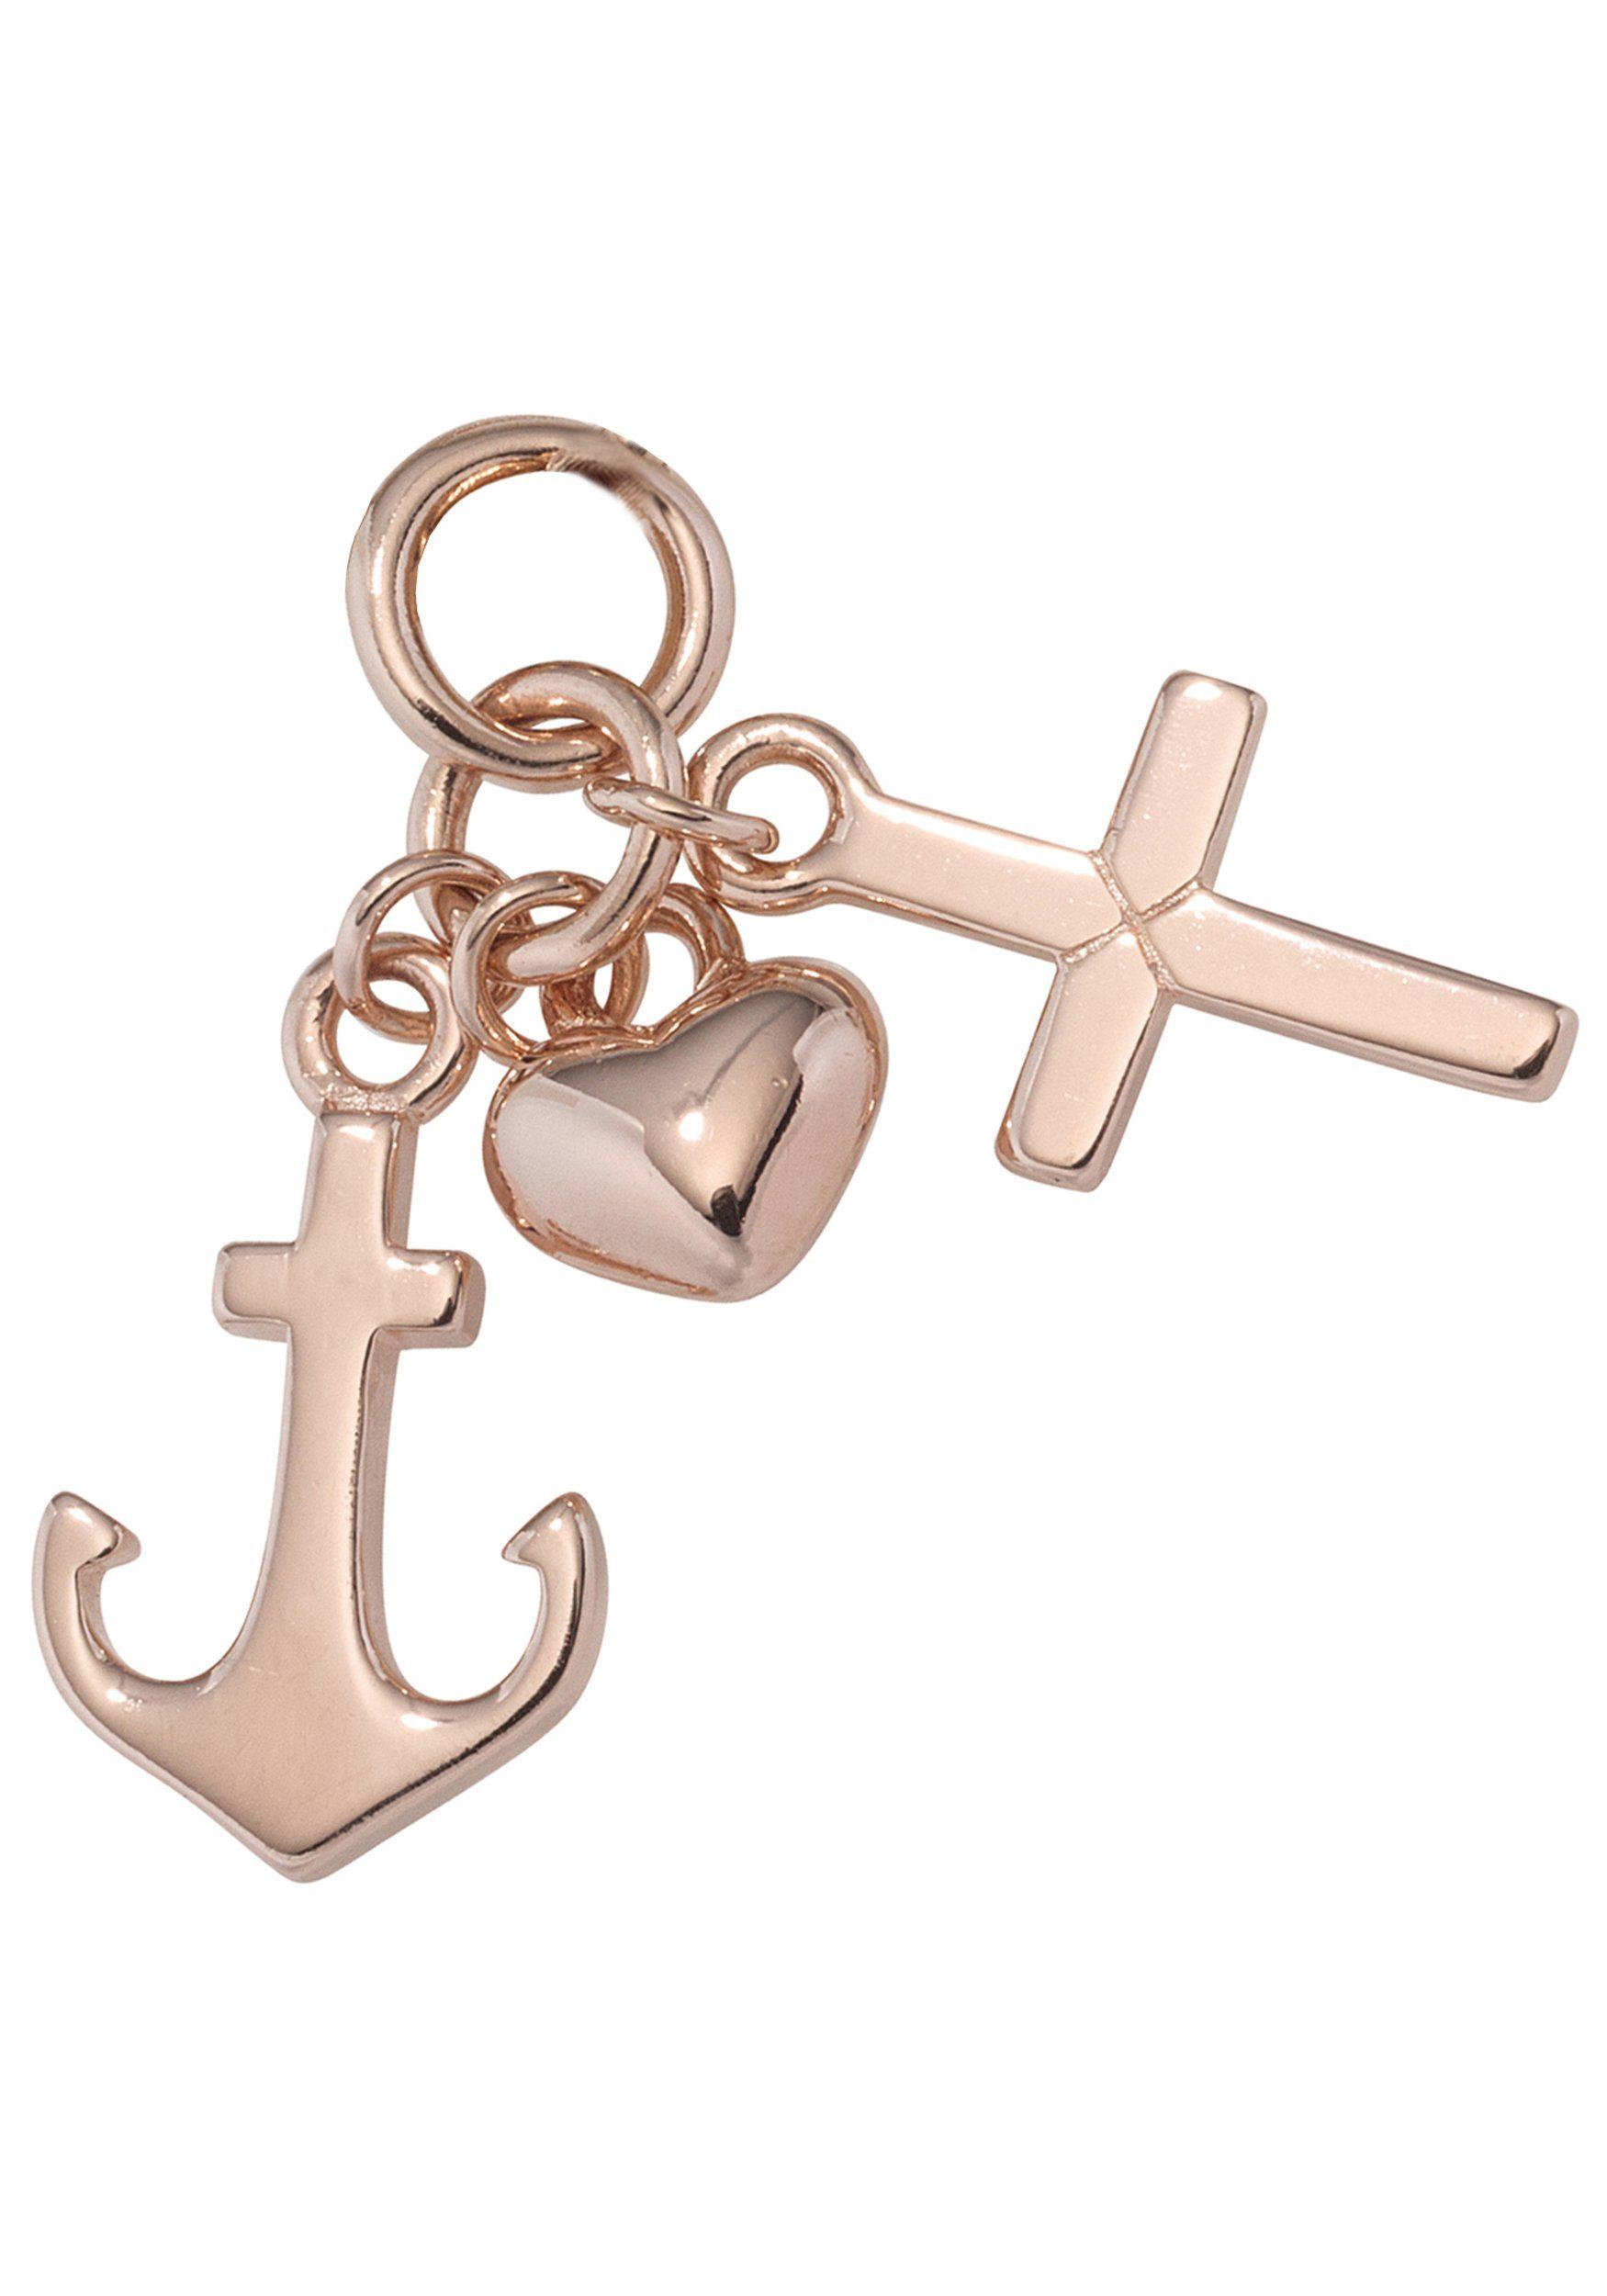 JOBO Kettenanhänger »Glaube, Liebe, Hoffnung« 925 Silber roségold vergoldet